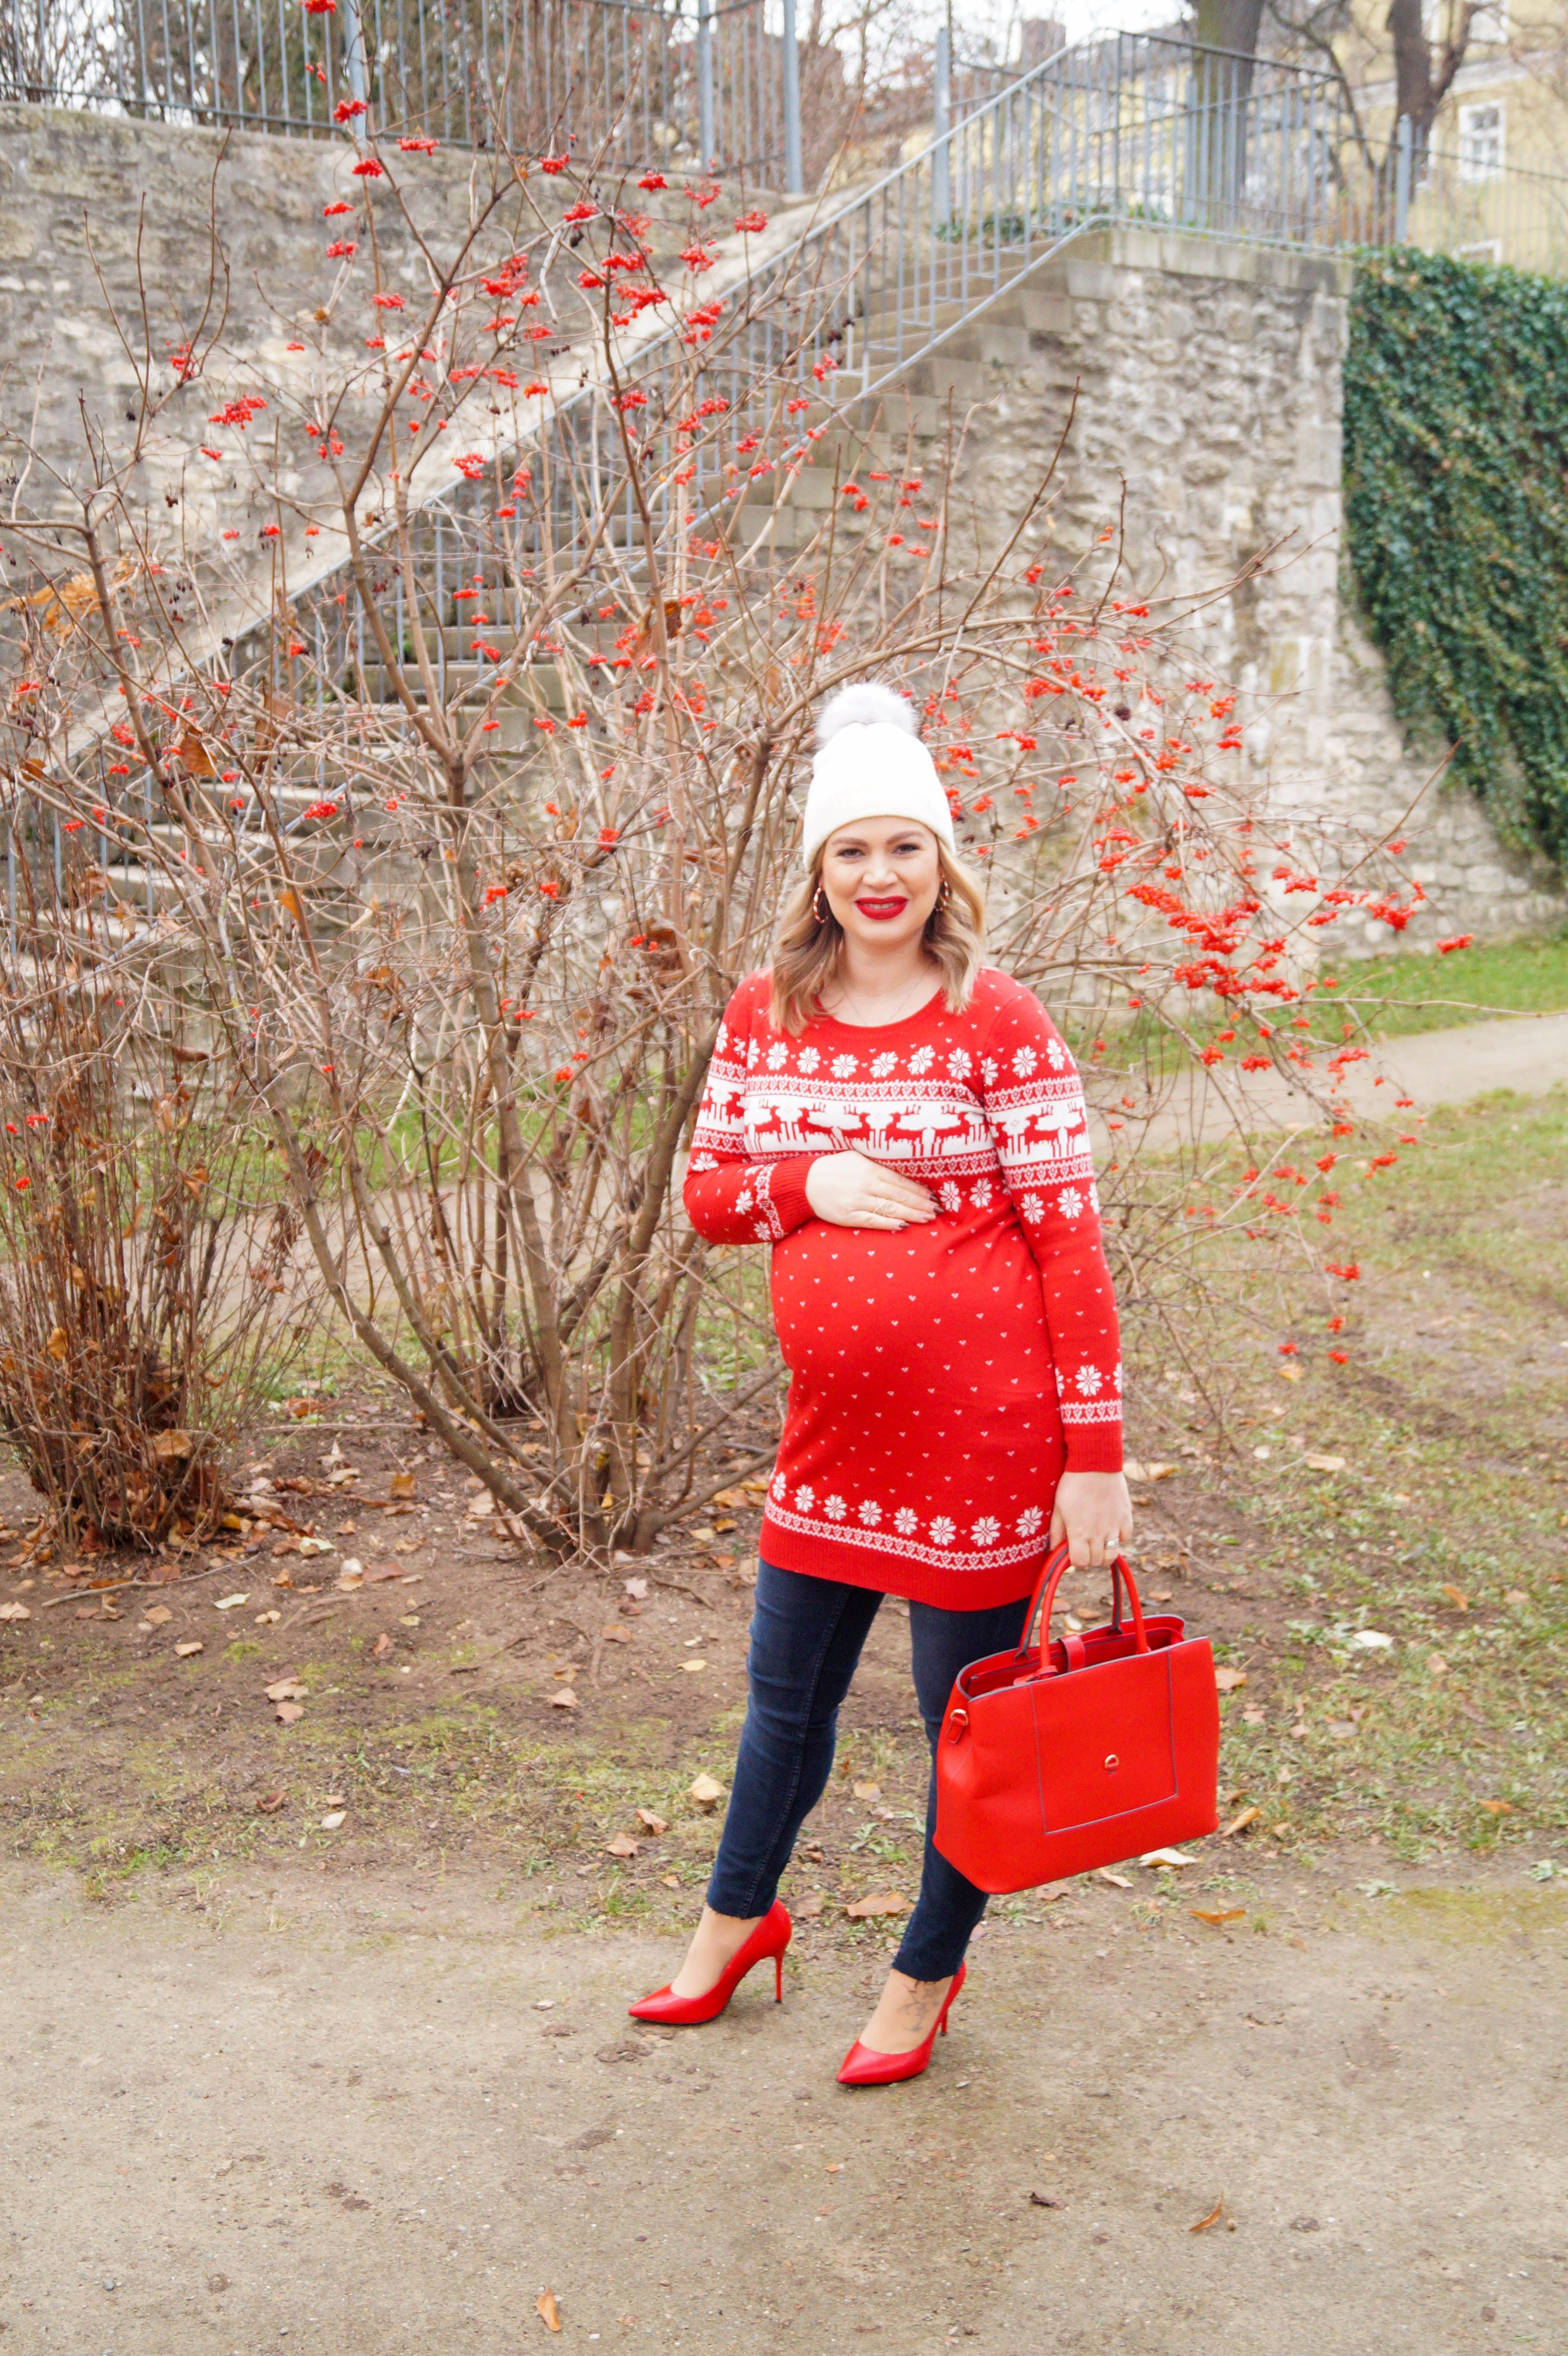 #christmasstyle #christmas #fashion #fashionblogger #MadameSchischi #styleblogger #maternitystyle #dressthebump #winterstyle #redforchristmas #reindeersweater #christmassweater